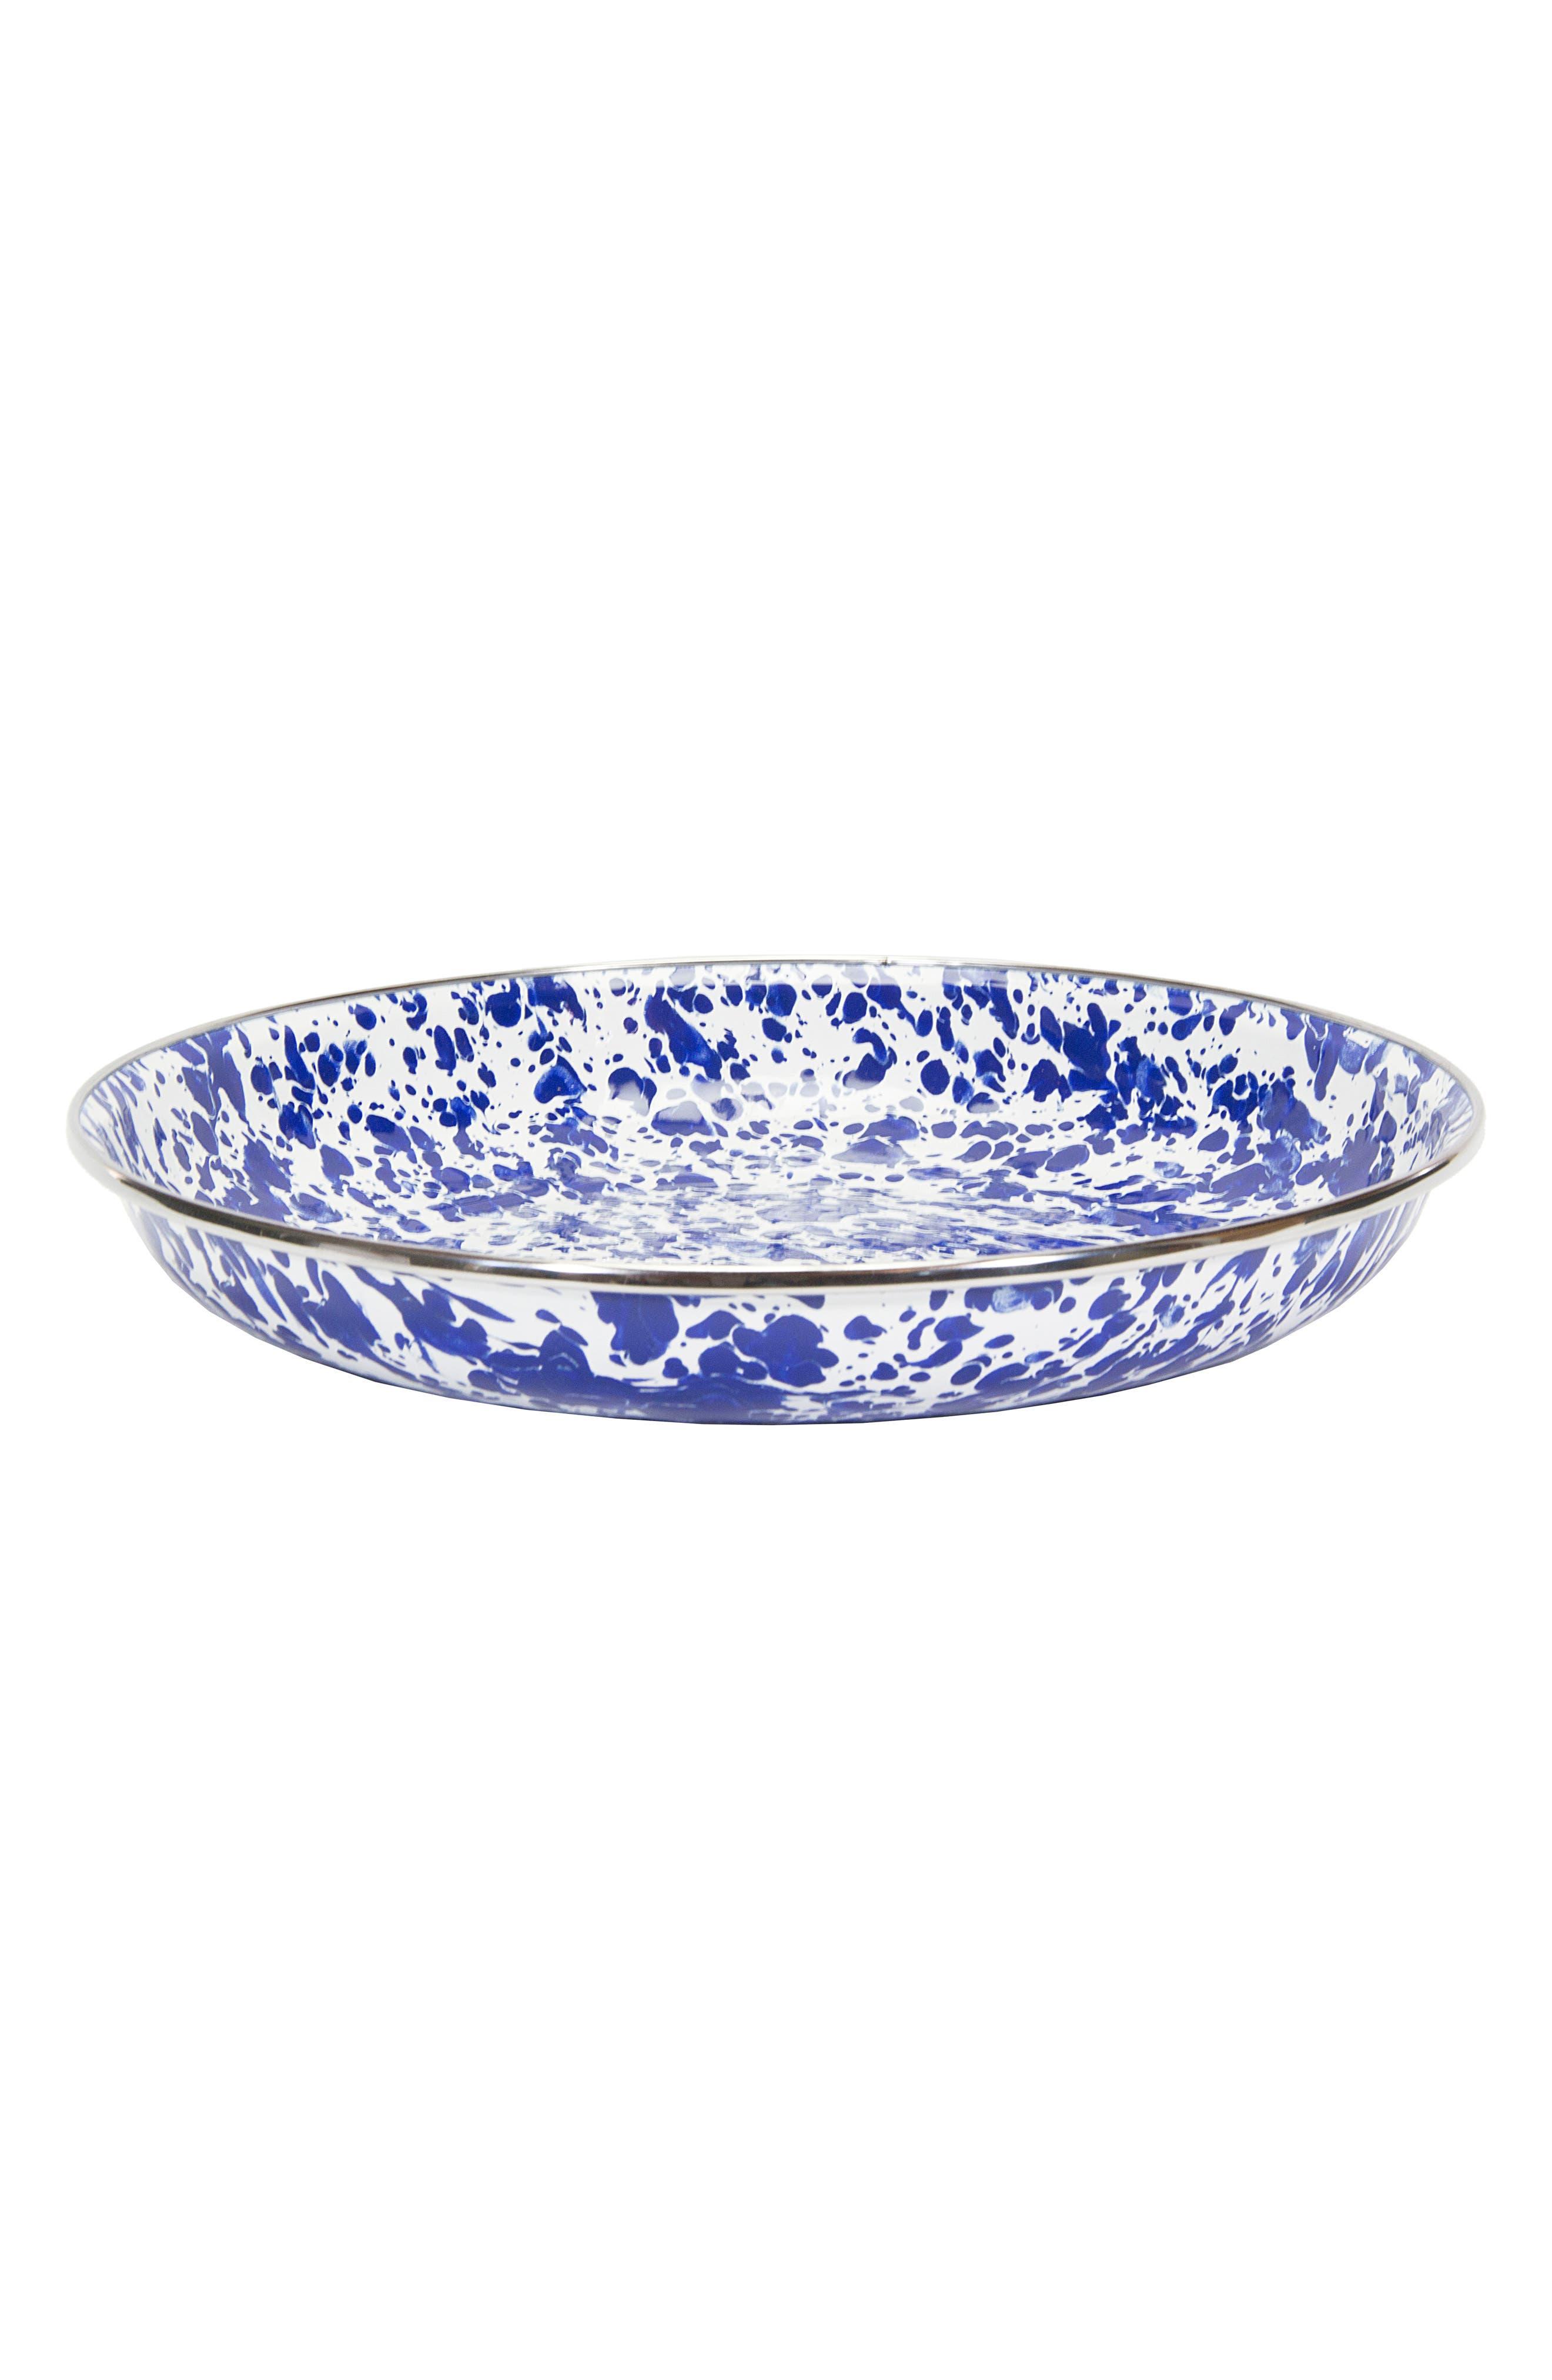 Pasta Plate,                             Main thumbnail 1, color,                             Blue Swirl